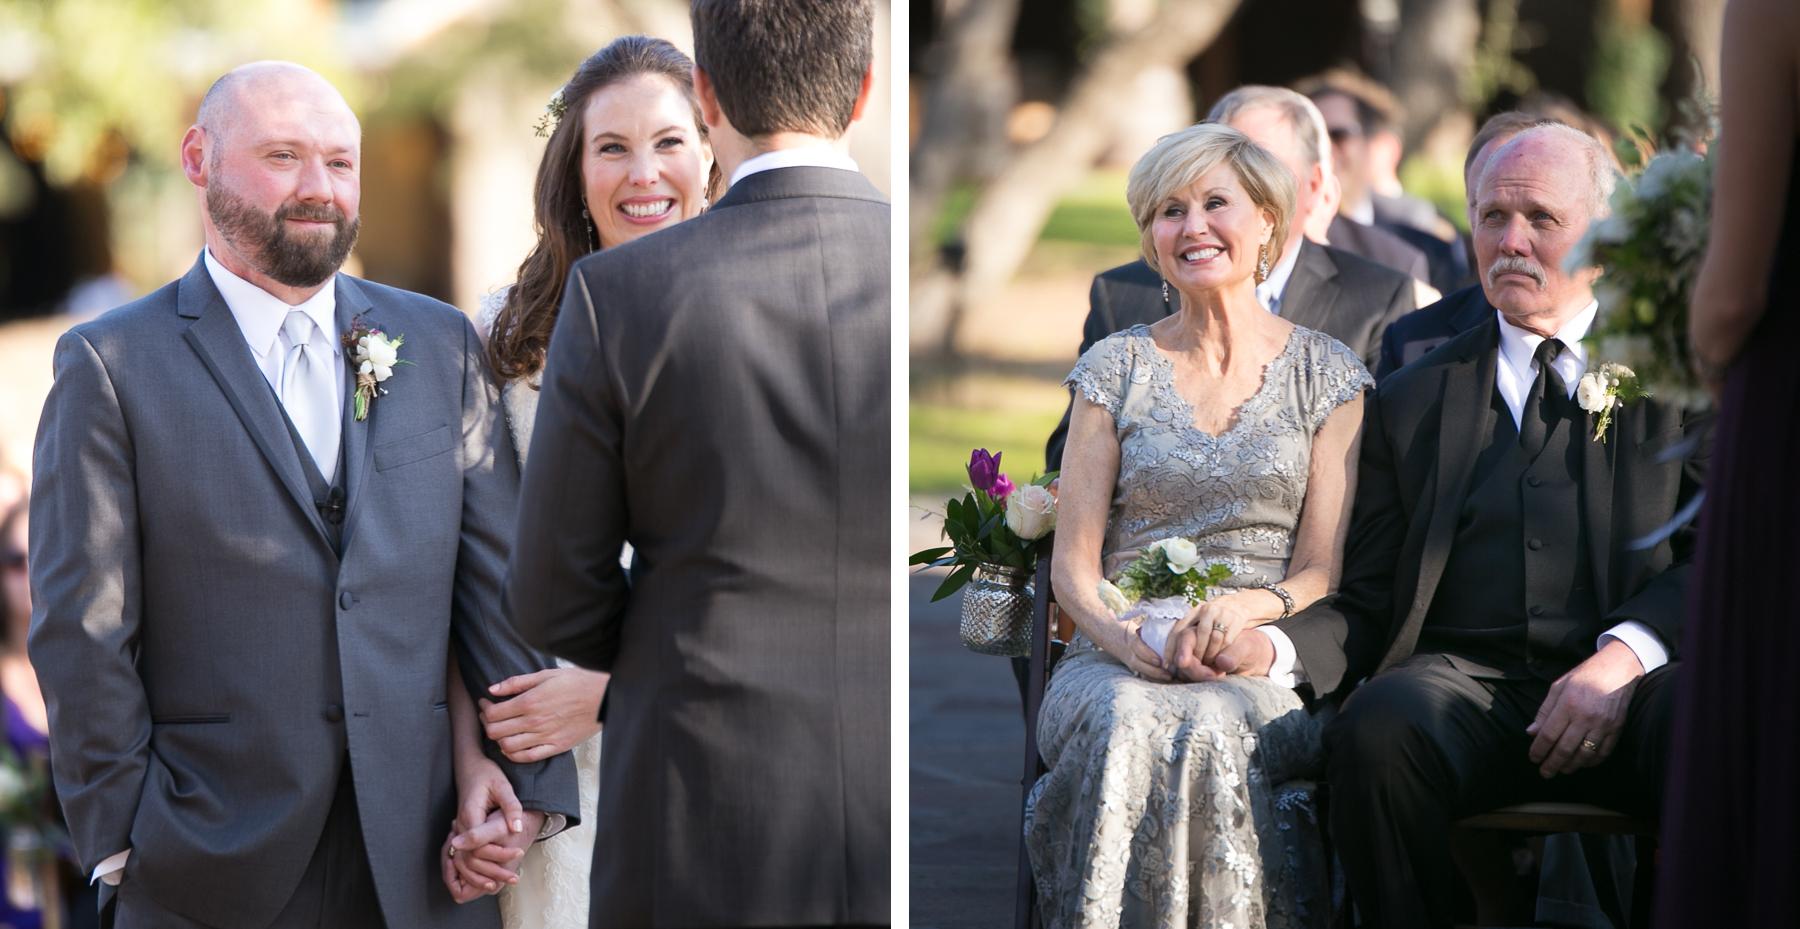 candid-wedding-ceremony-photographs.jpg